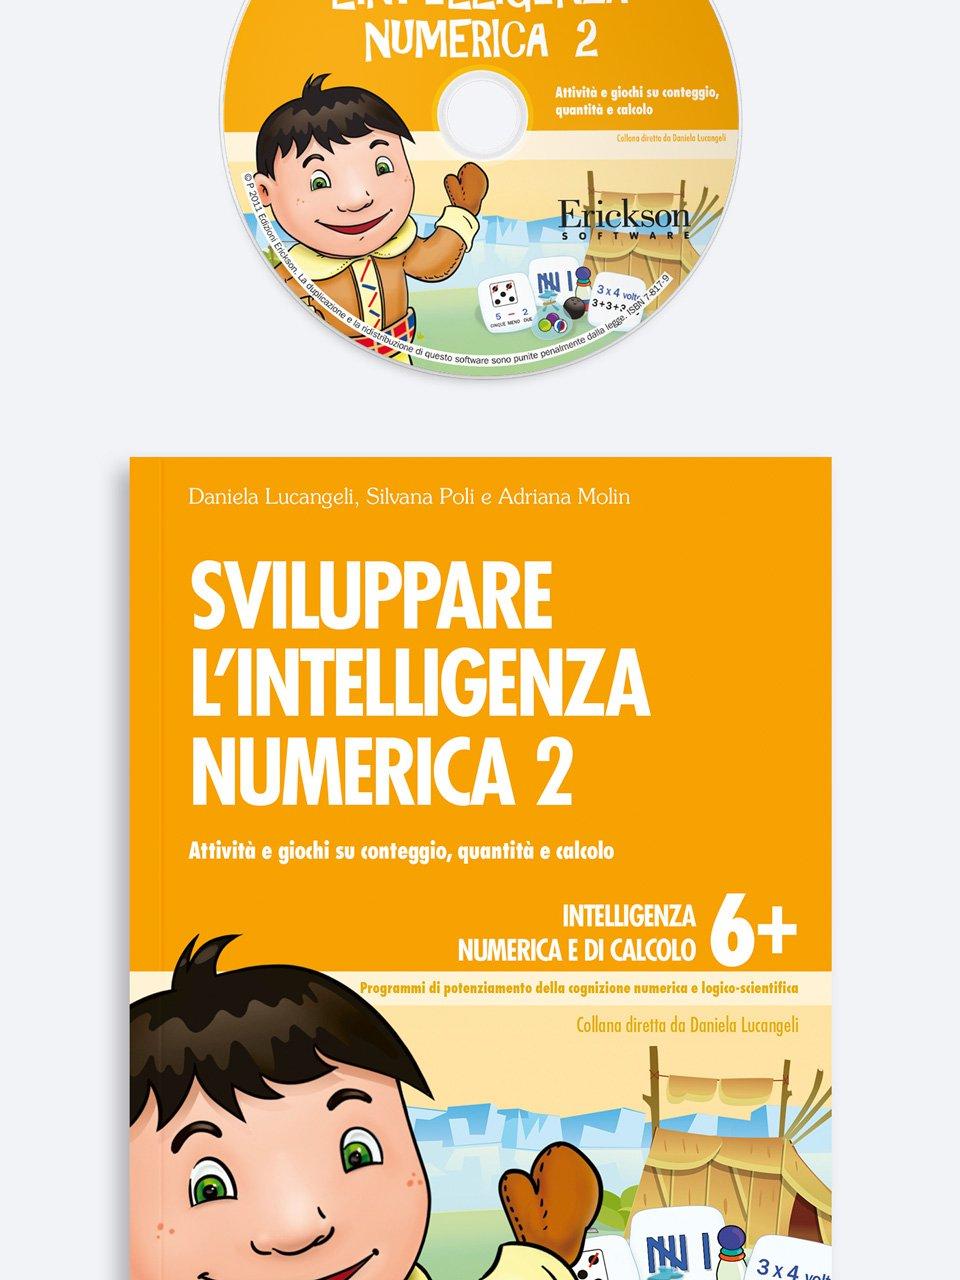 Sviluppare l'intelligenza numerica 2 - Daniela Lucangeli - Erickson